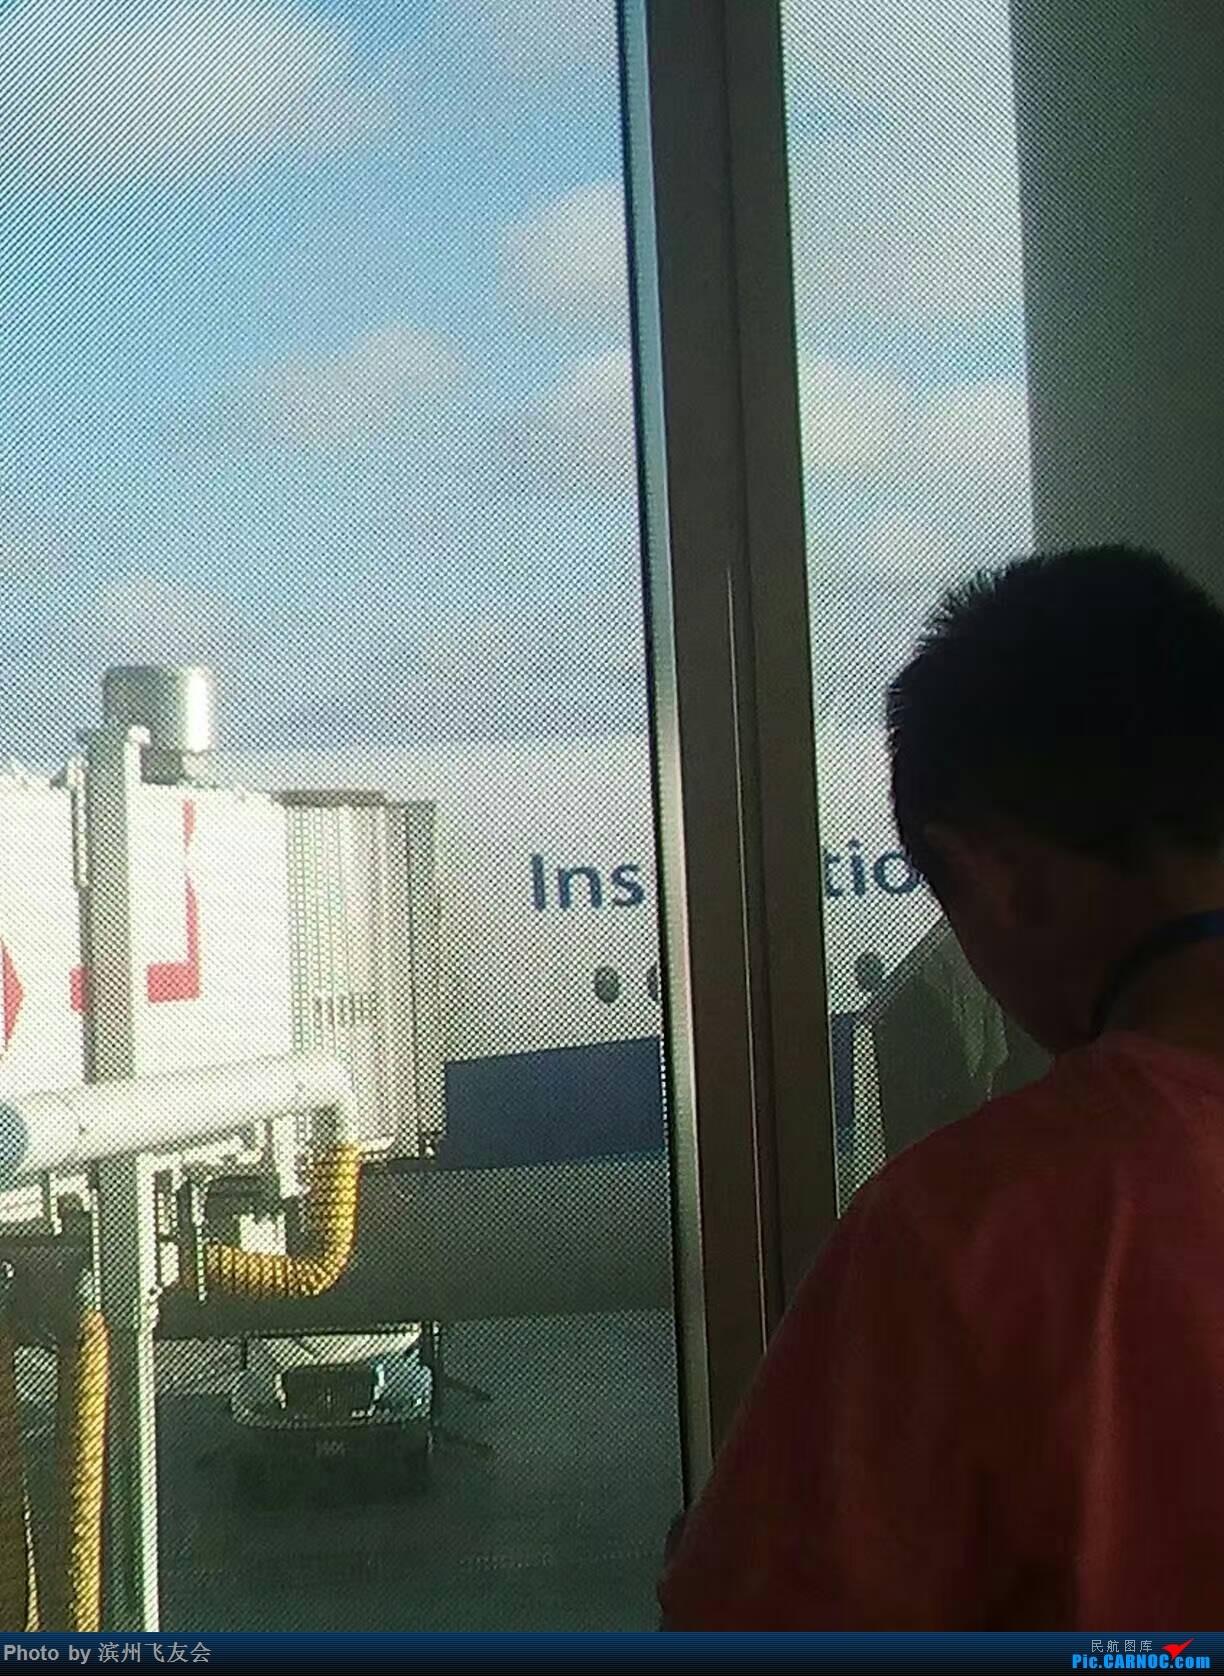 Re:[原创]全日空美国游记2-东京羽田,洛杉矶 BOEING 777-200ER  美国洛杉矶机场